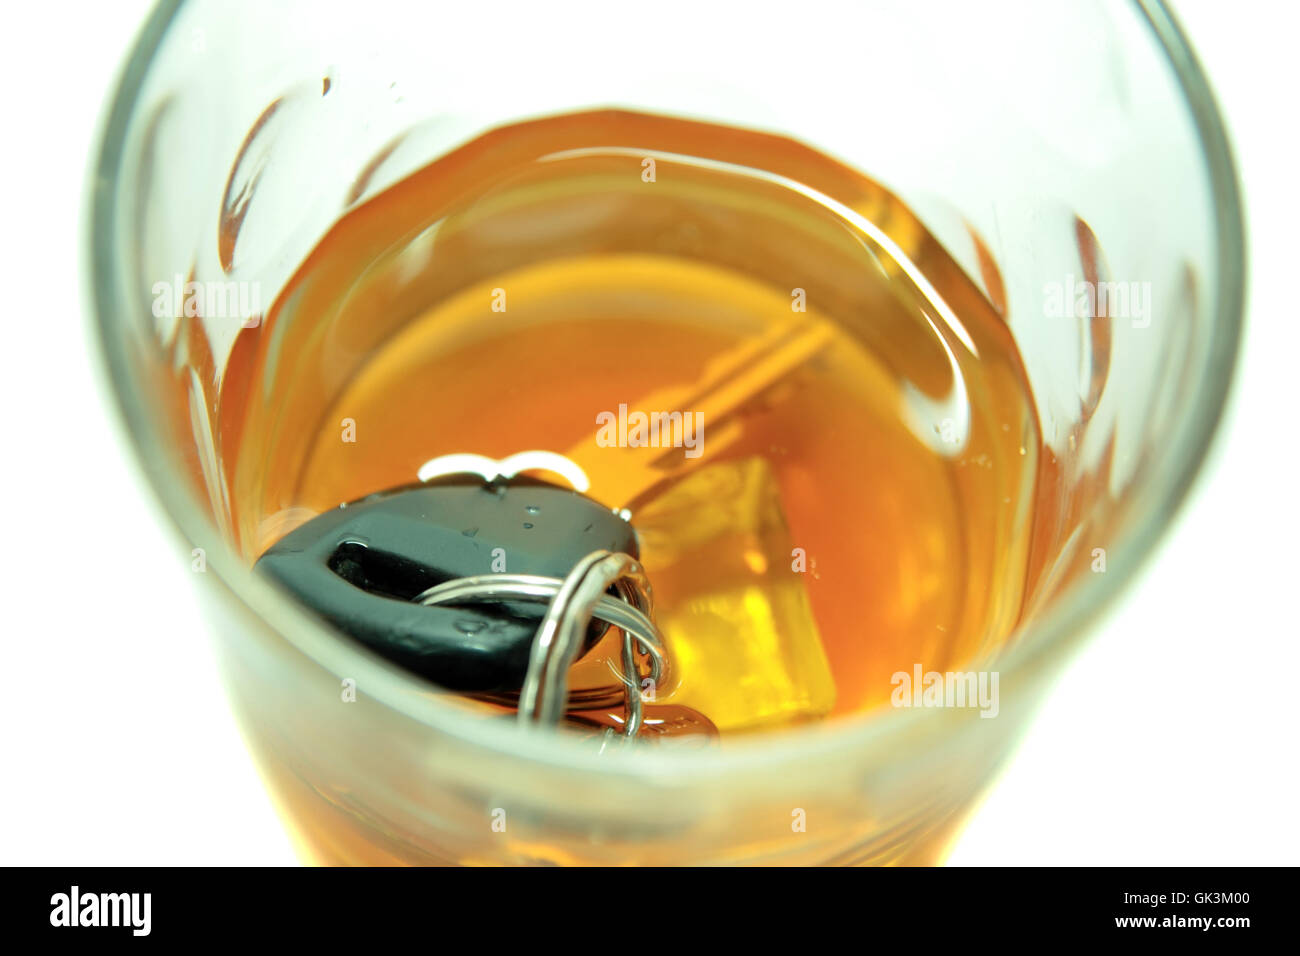 drink drinking bibs - Stock Image